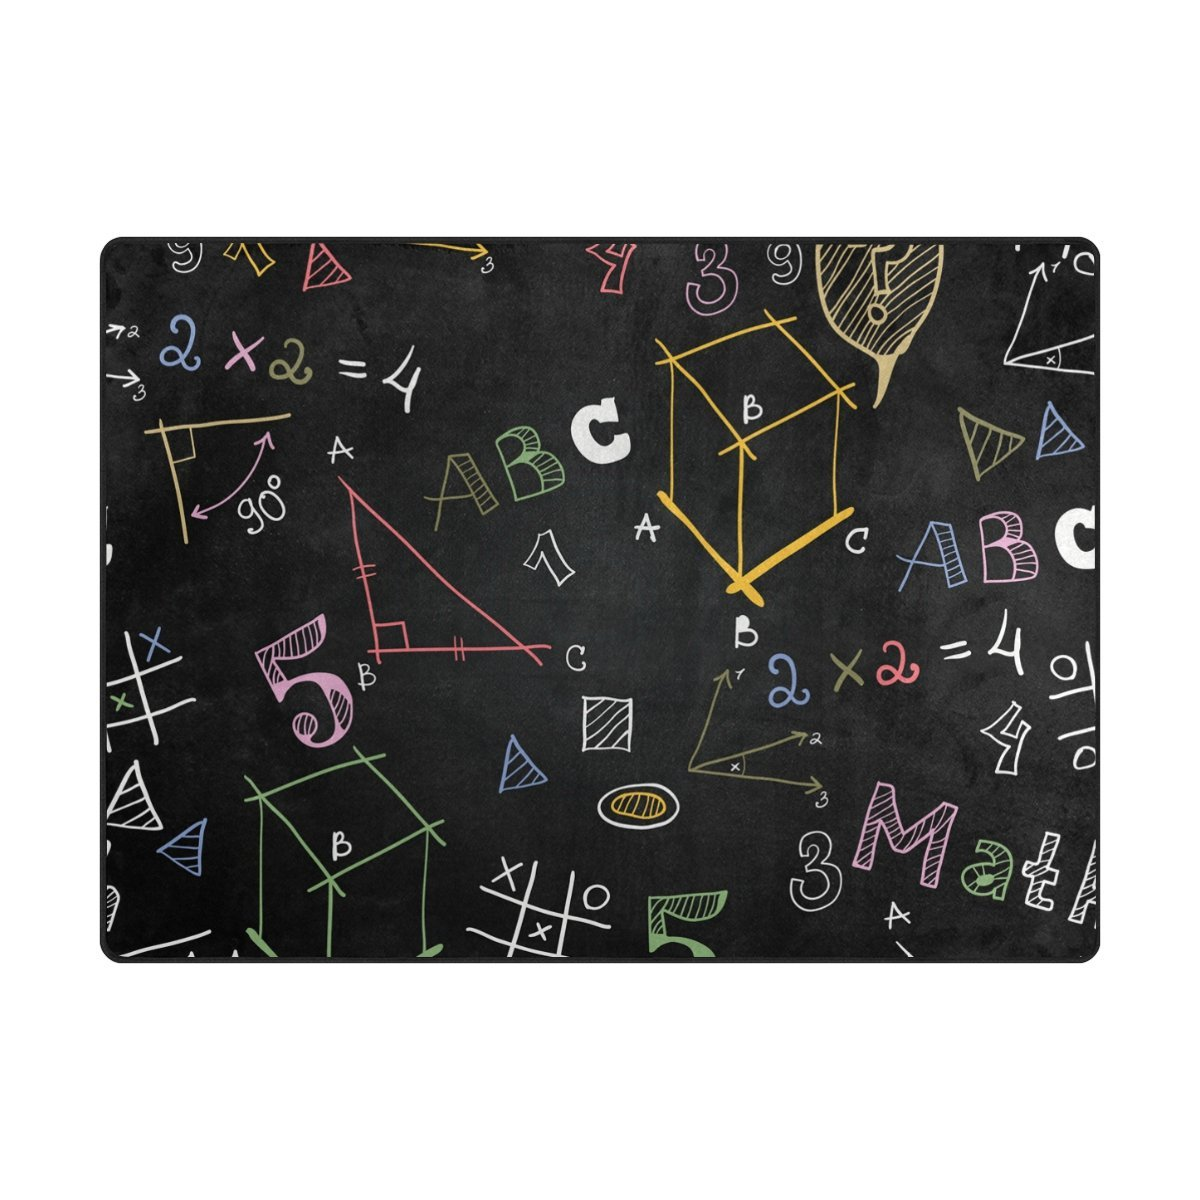 Vantaso Soft Foam Area Rugs Chalkboard School Math Formulas Non Slip Play Mats 63x48 inch for Kids Playing Living Room